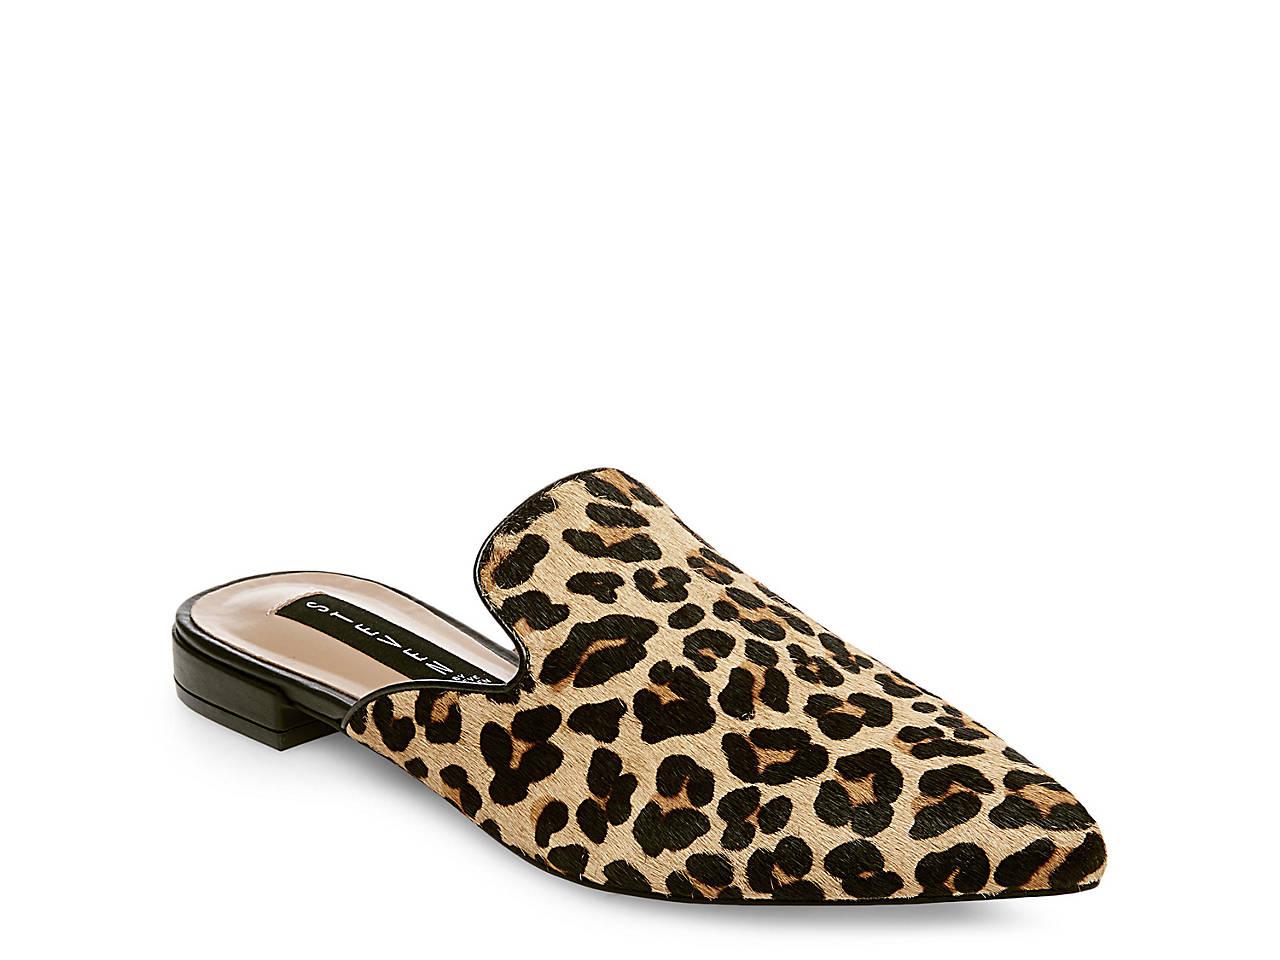 1a7091b6db6 Steven by Steve Madden Velocity Mule Women s Shoes